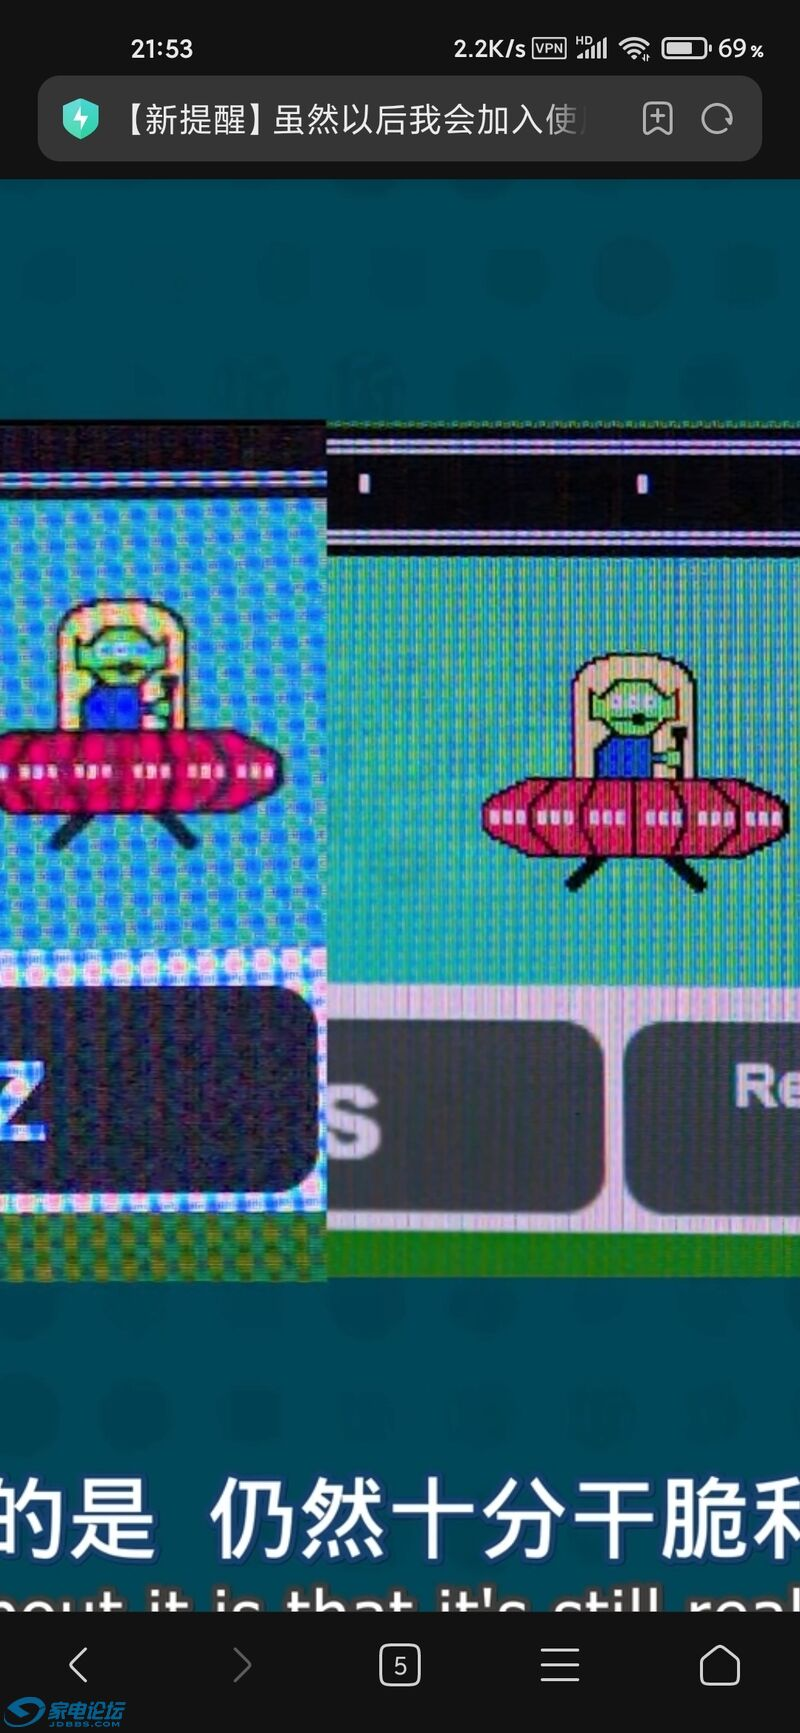 Screenshot_2021-10-12-21-53-52-822_com.android.browser.jpg